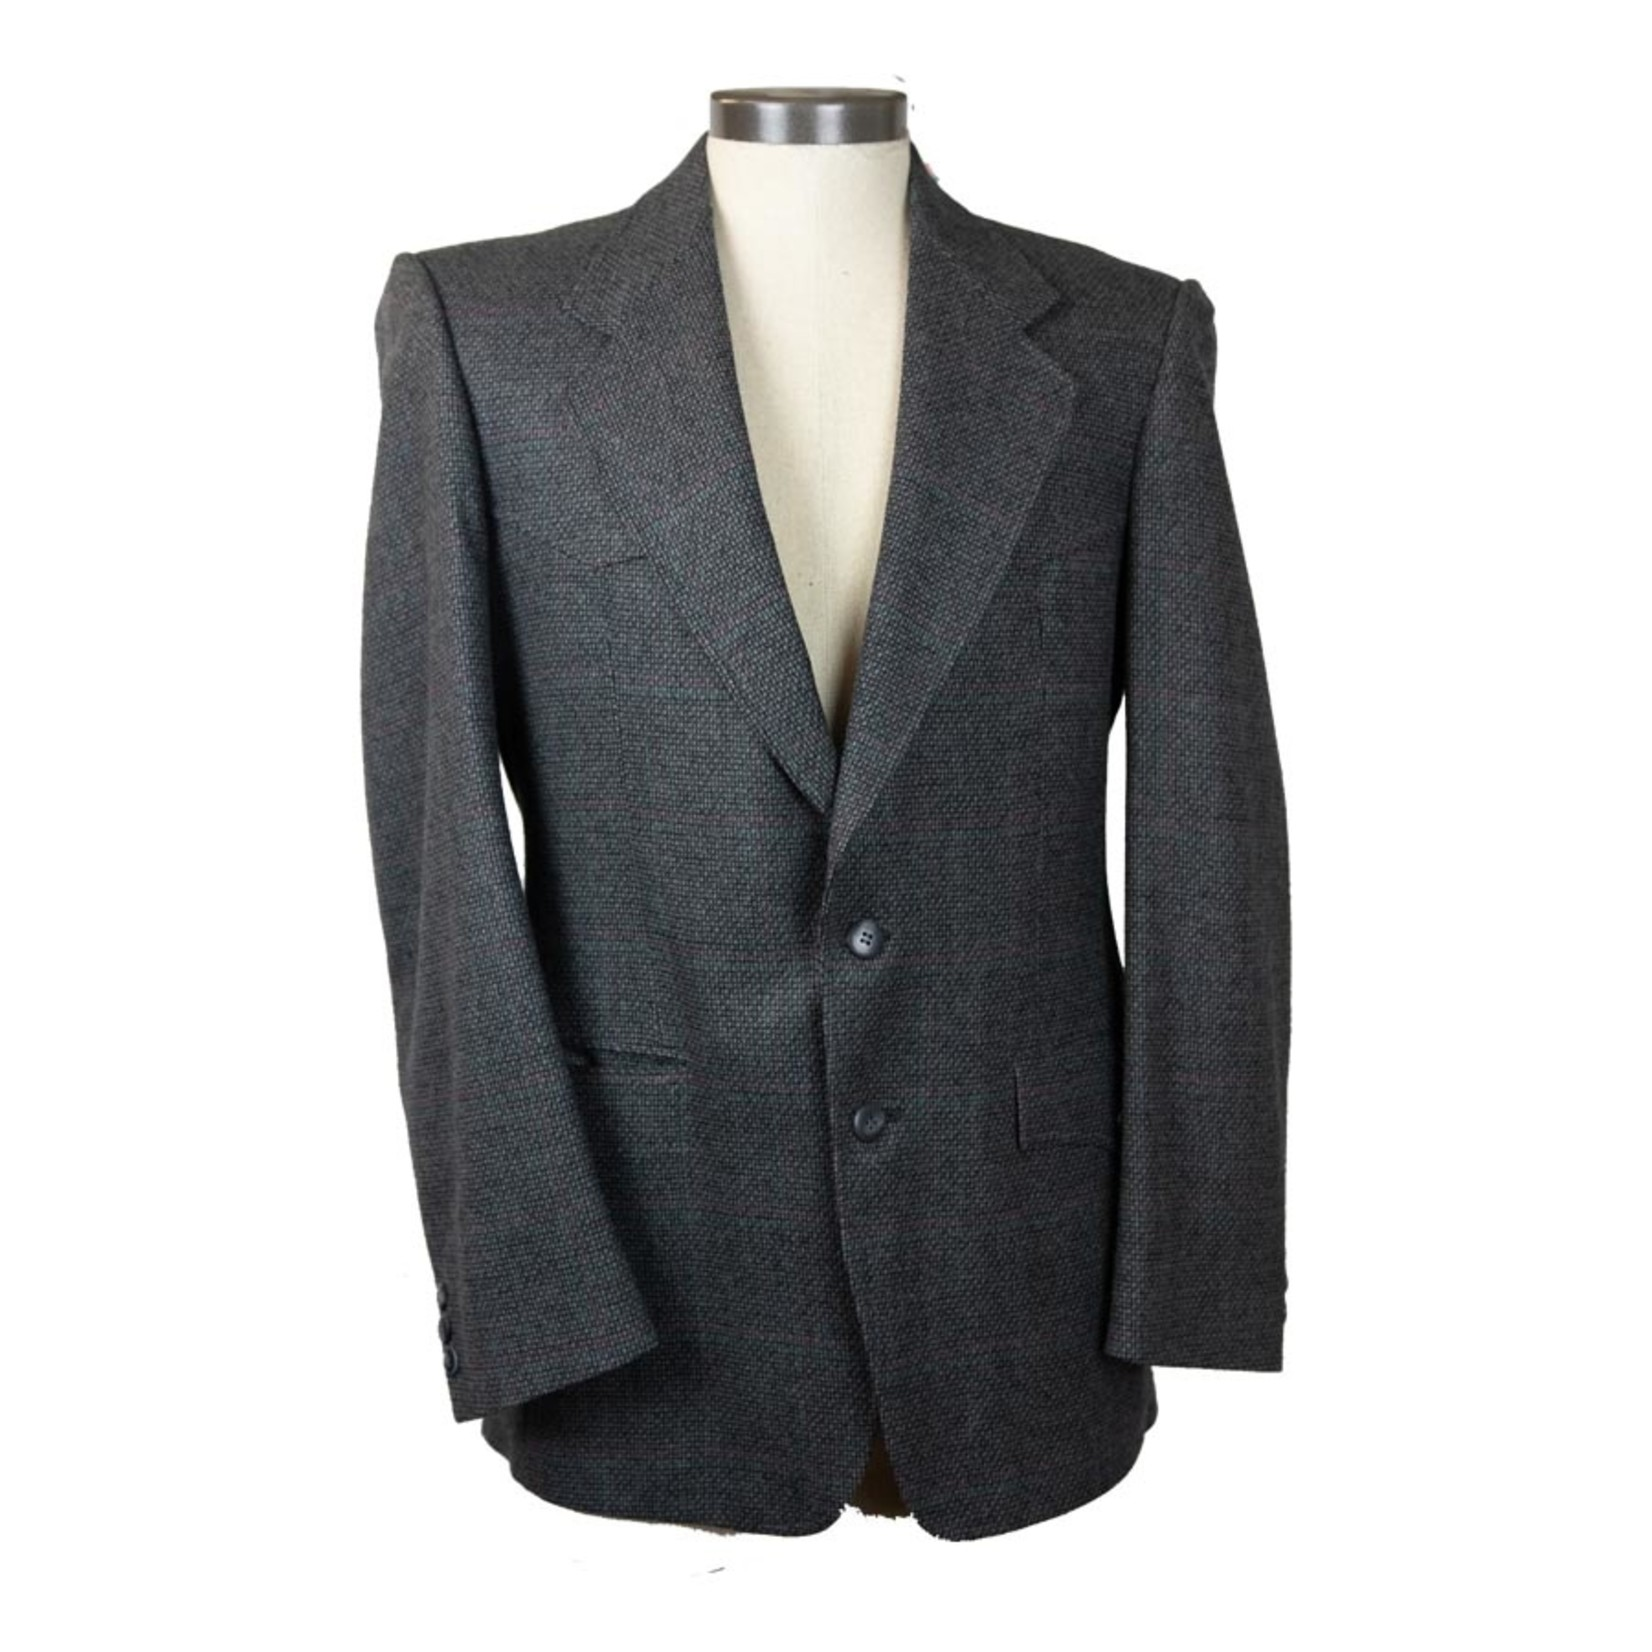 Admiration Wool Vintage Suit Jacket - Size 40 - #25